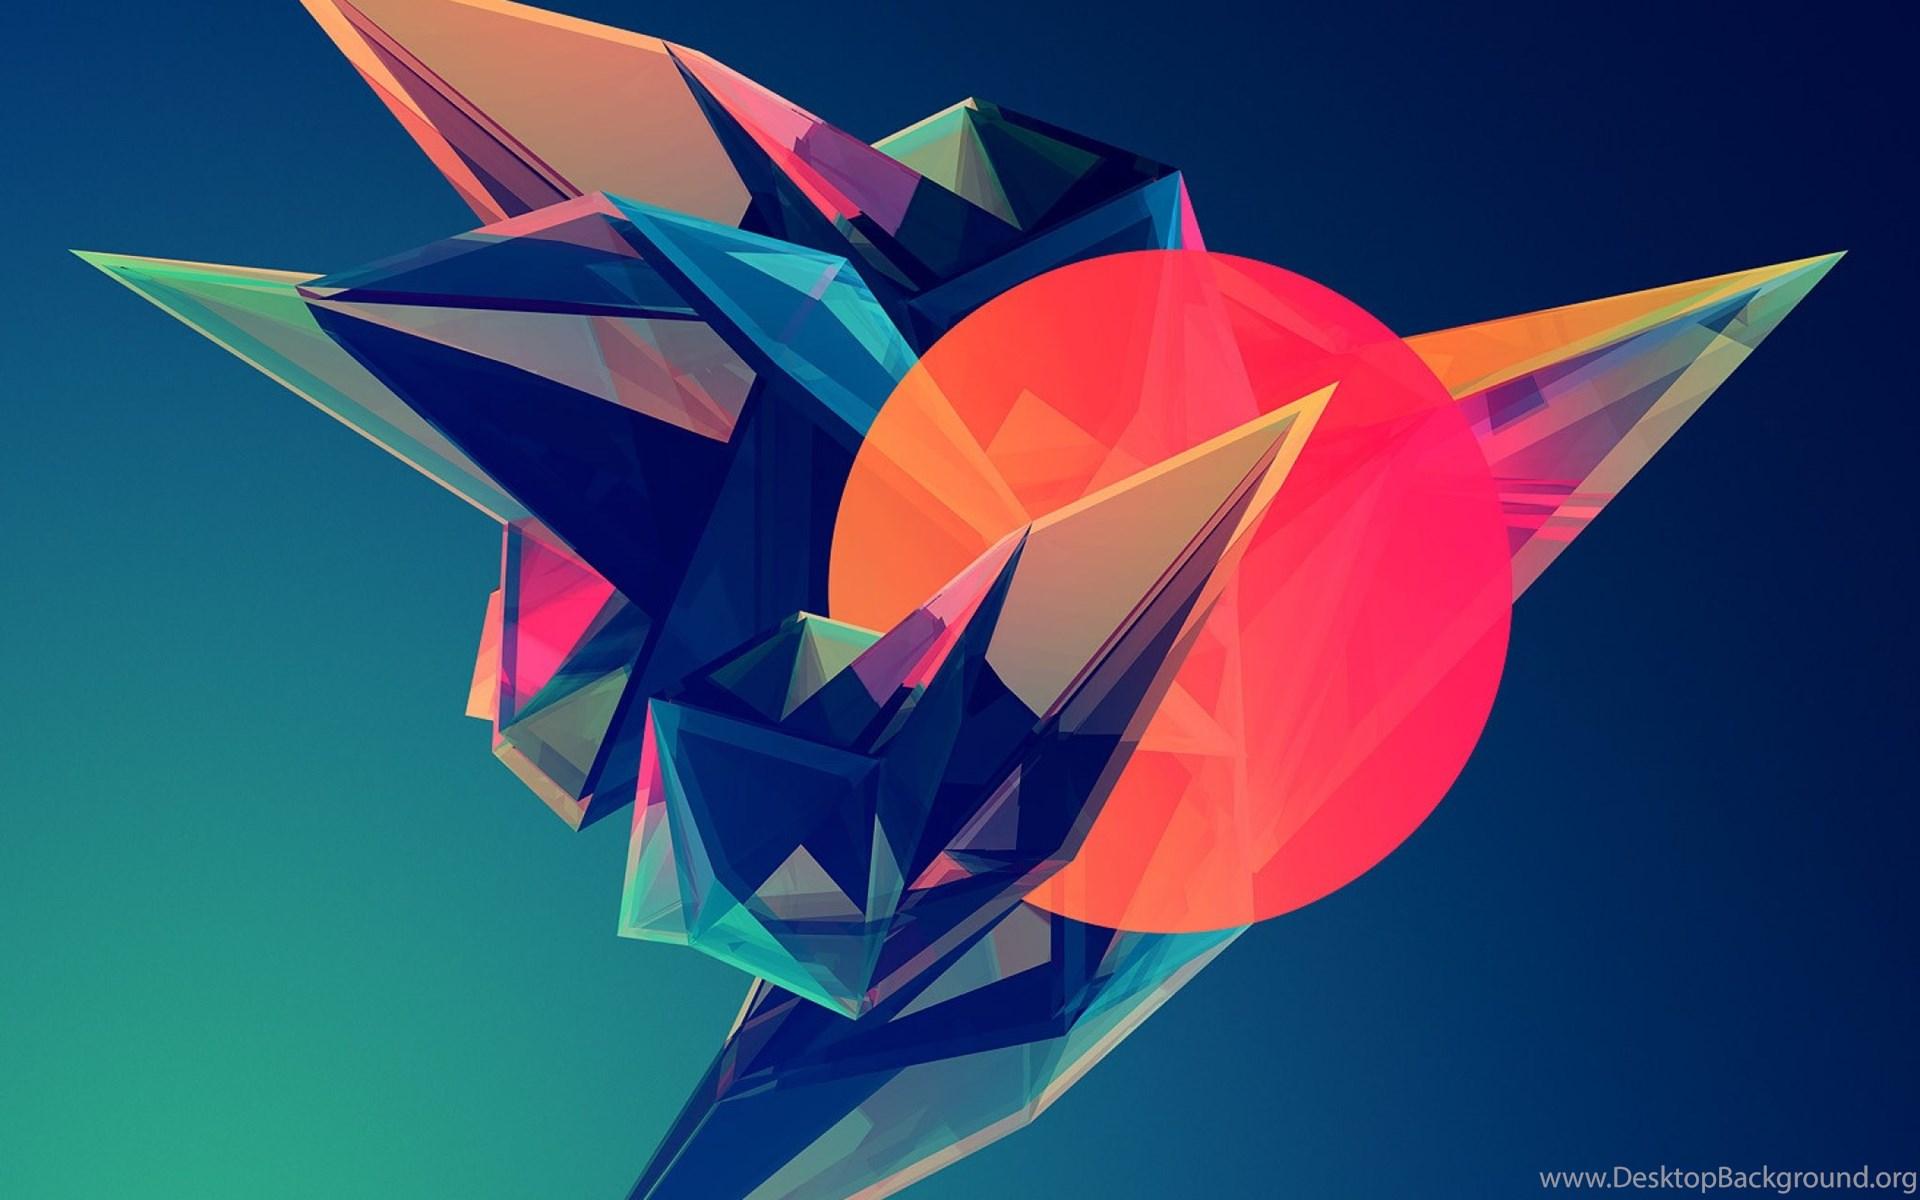 Pic New Posts Ipad 2 Wallpaper Resolution: Hipster Triangle Post Modern Abstract Minimalist Art IPad